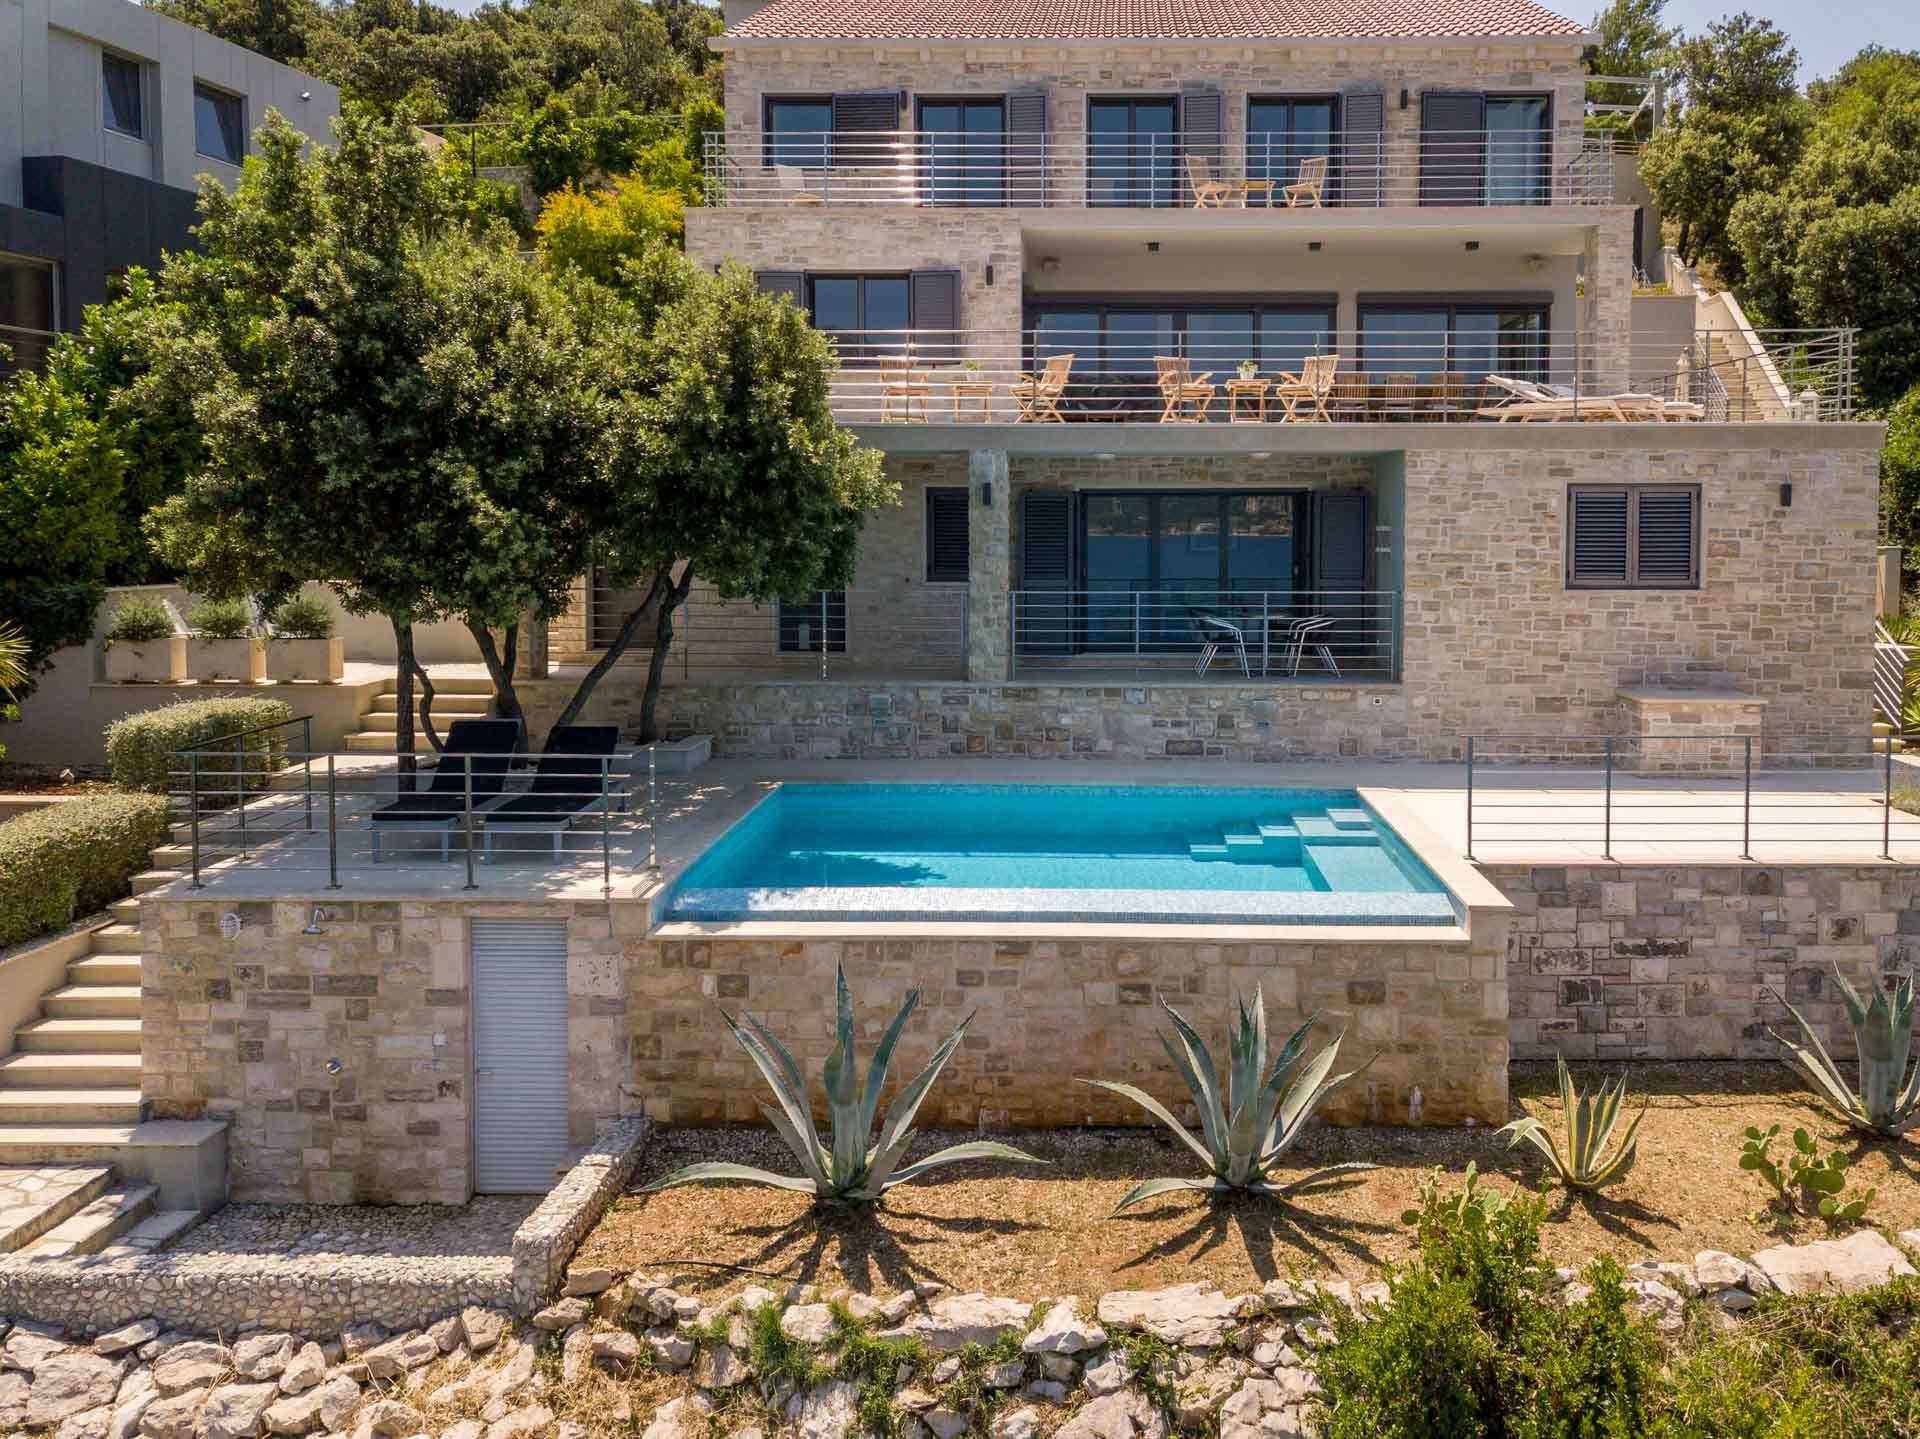 Luxury vacation rentals europe - Croatia - Korcula island - Zrnovska banja - Marinero - Image 1/45